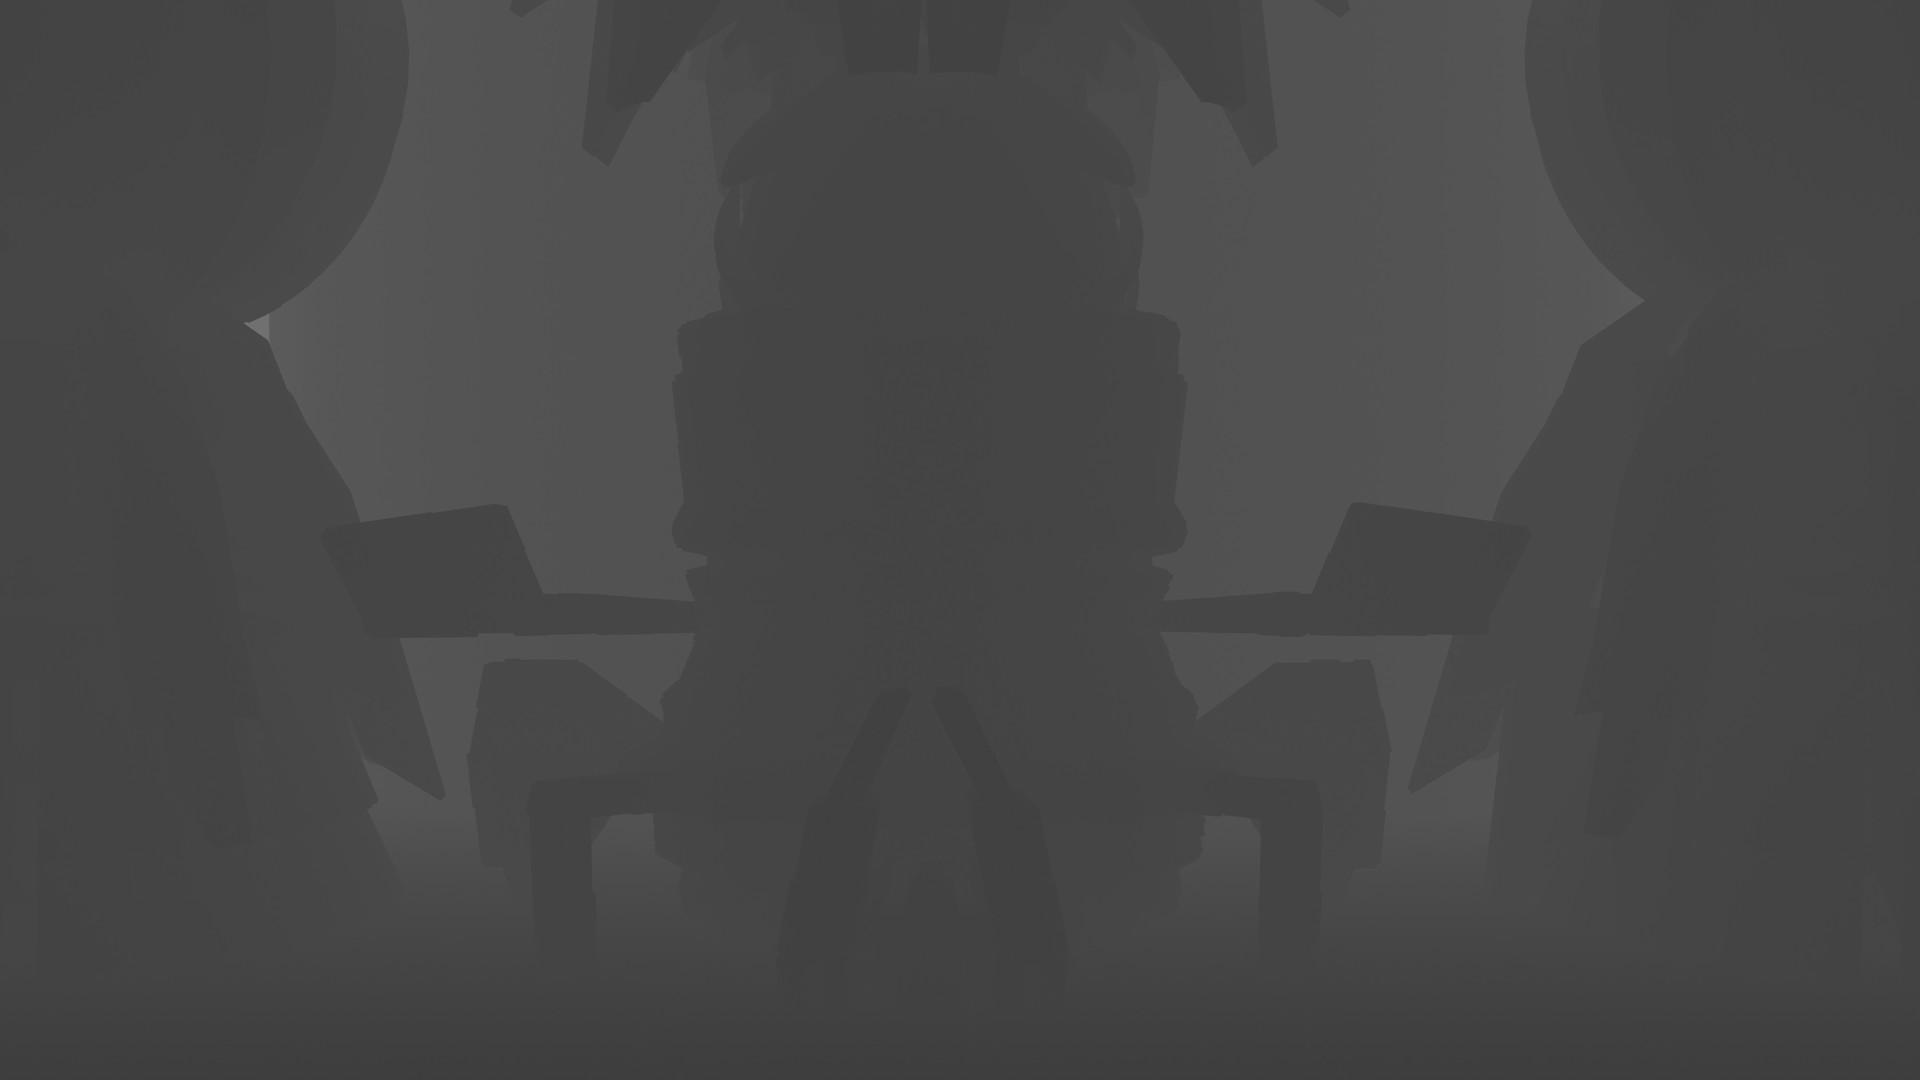 Kresimir jelusic robob3ar 244 130616 z